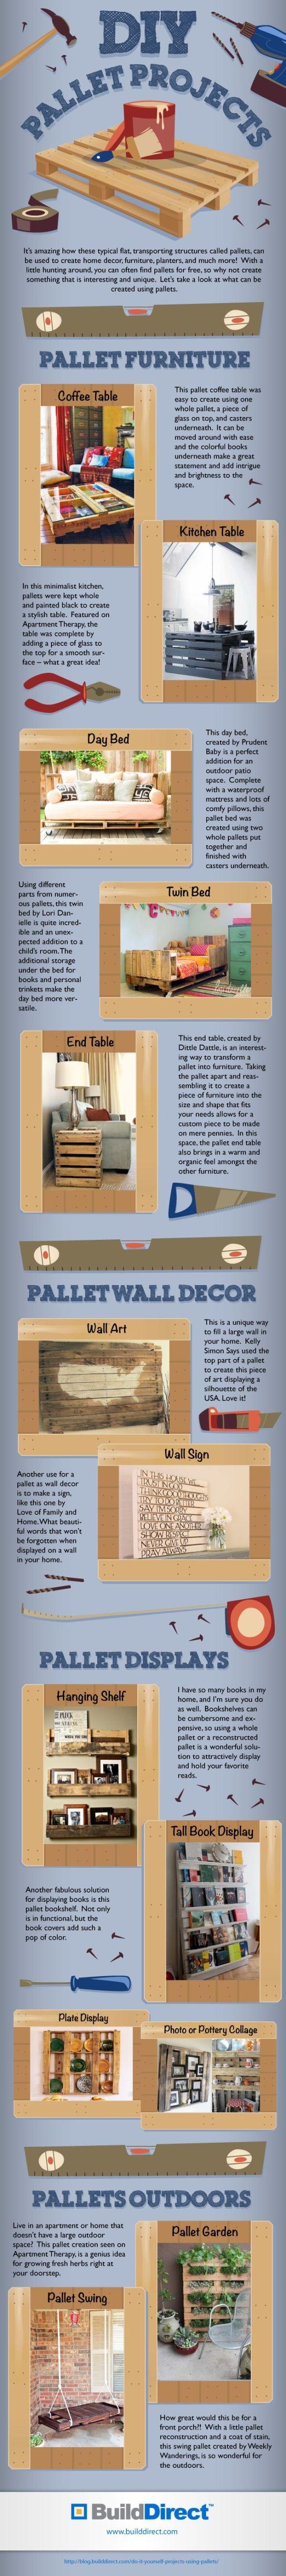 DIY Pallets4 DIY Pallet Projects by jfmcb